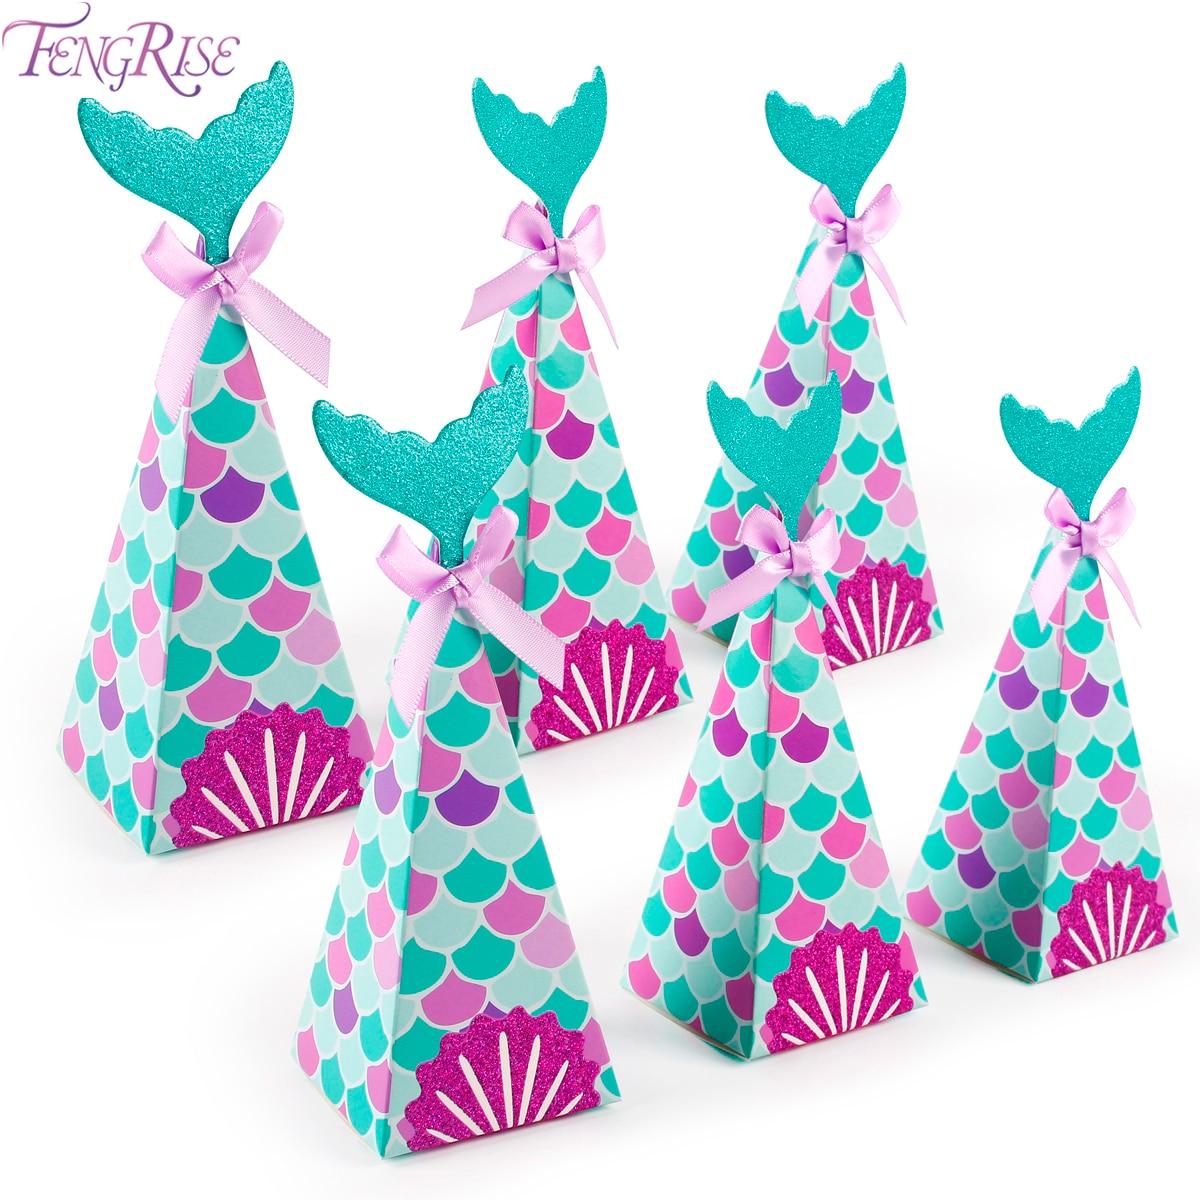 FENGRISE kleine Meerjungfrau Party Geschenk Candy Boxen Meerjungfrau Geburtstag Party Decor Kinder Geburtstag Partei Liefert 1 jahr Geburtstag Decor